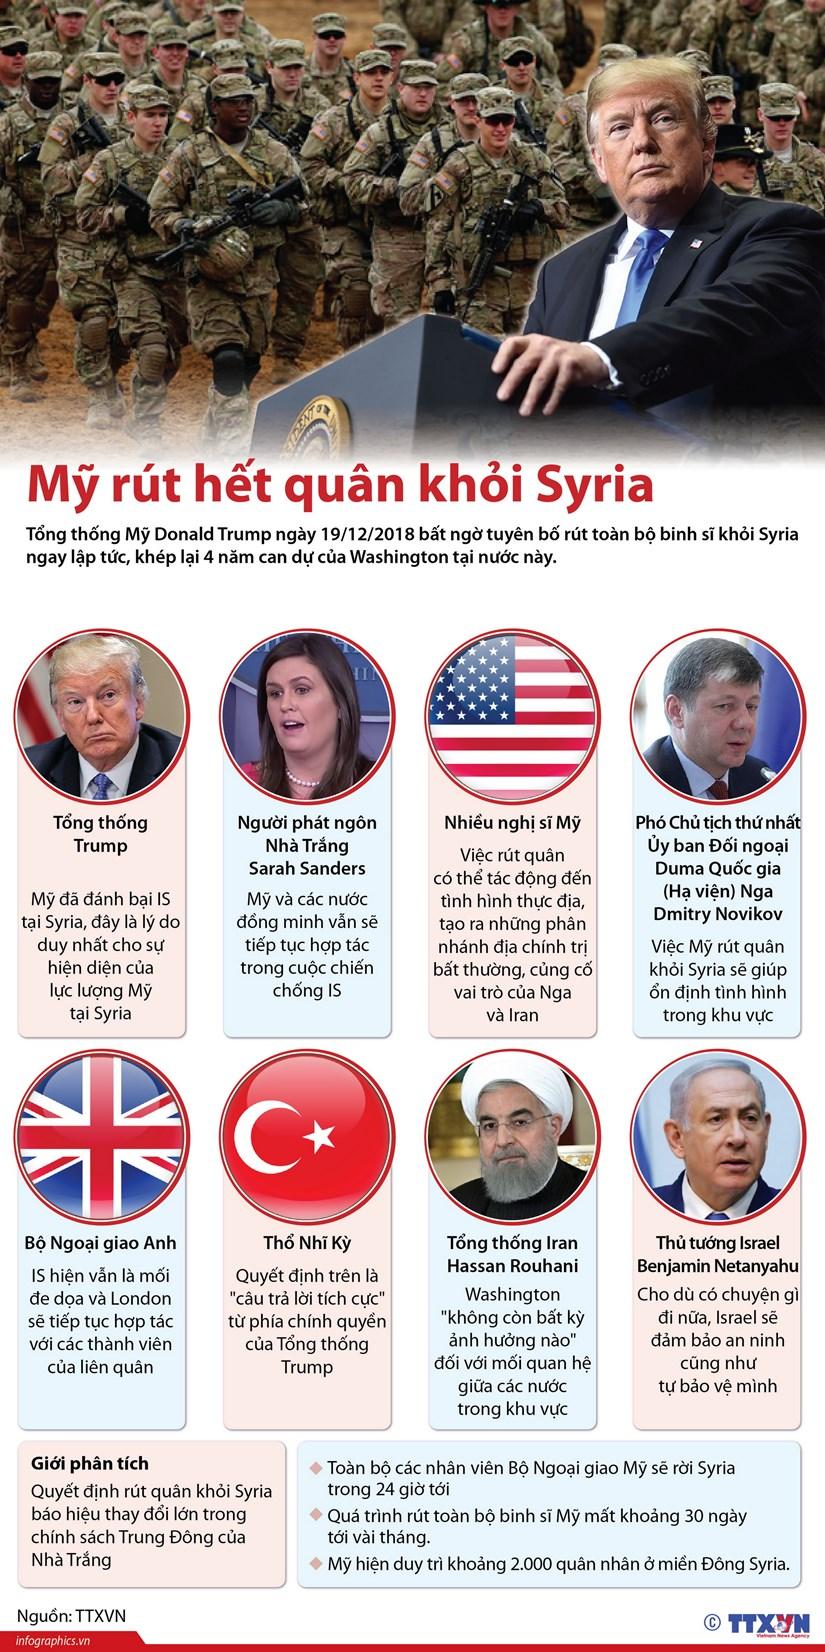 [Infographics] Phan ung cua cac nuoc khi My rut quan khoi Syria hinh anh 1